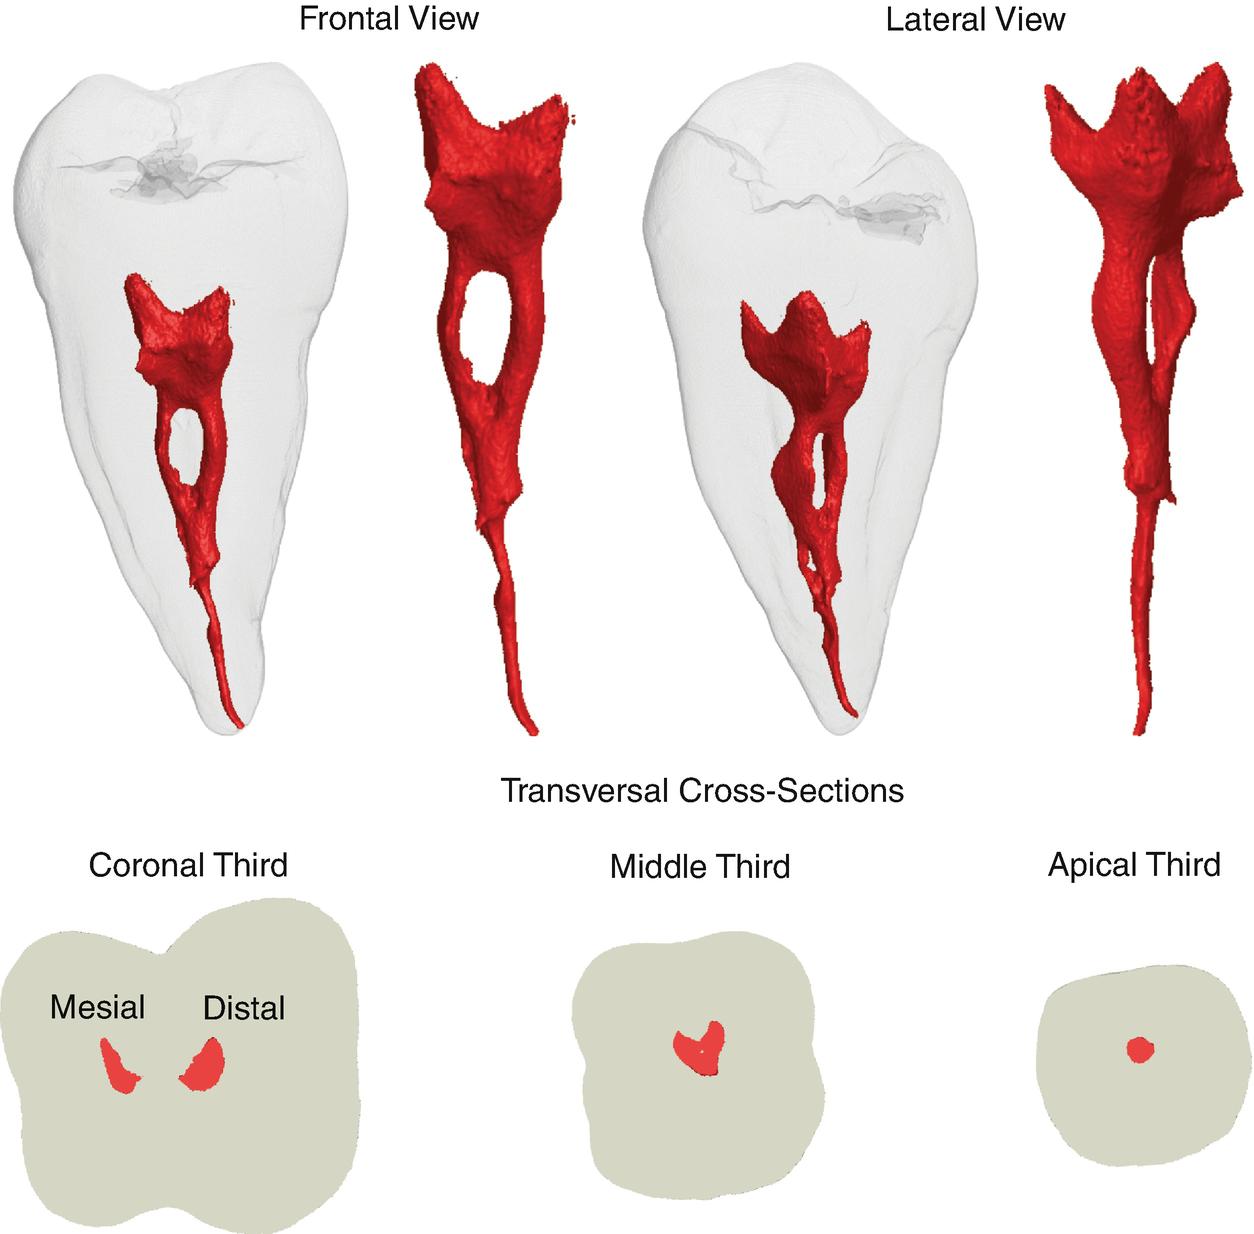 Root Canal Anatomy Of Maxillary And Mandibular Teeth